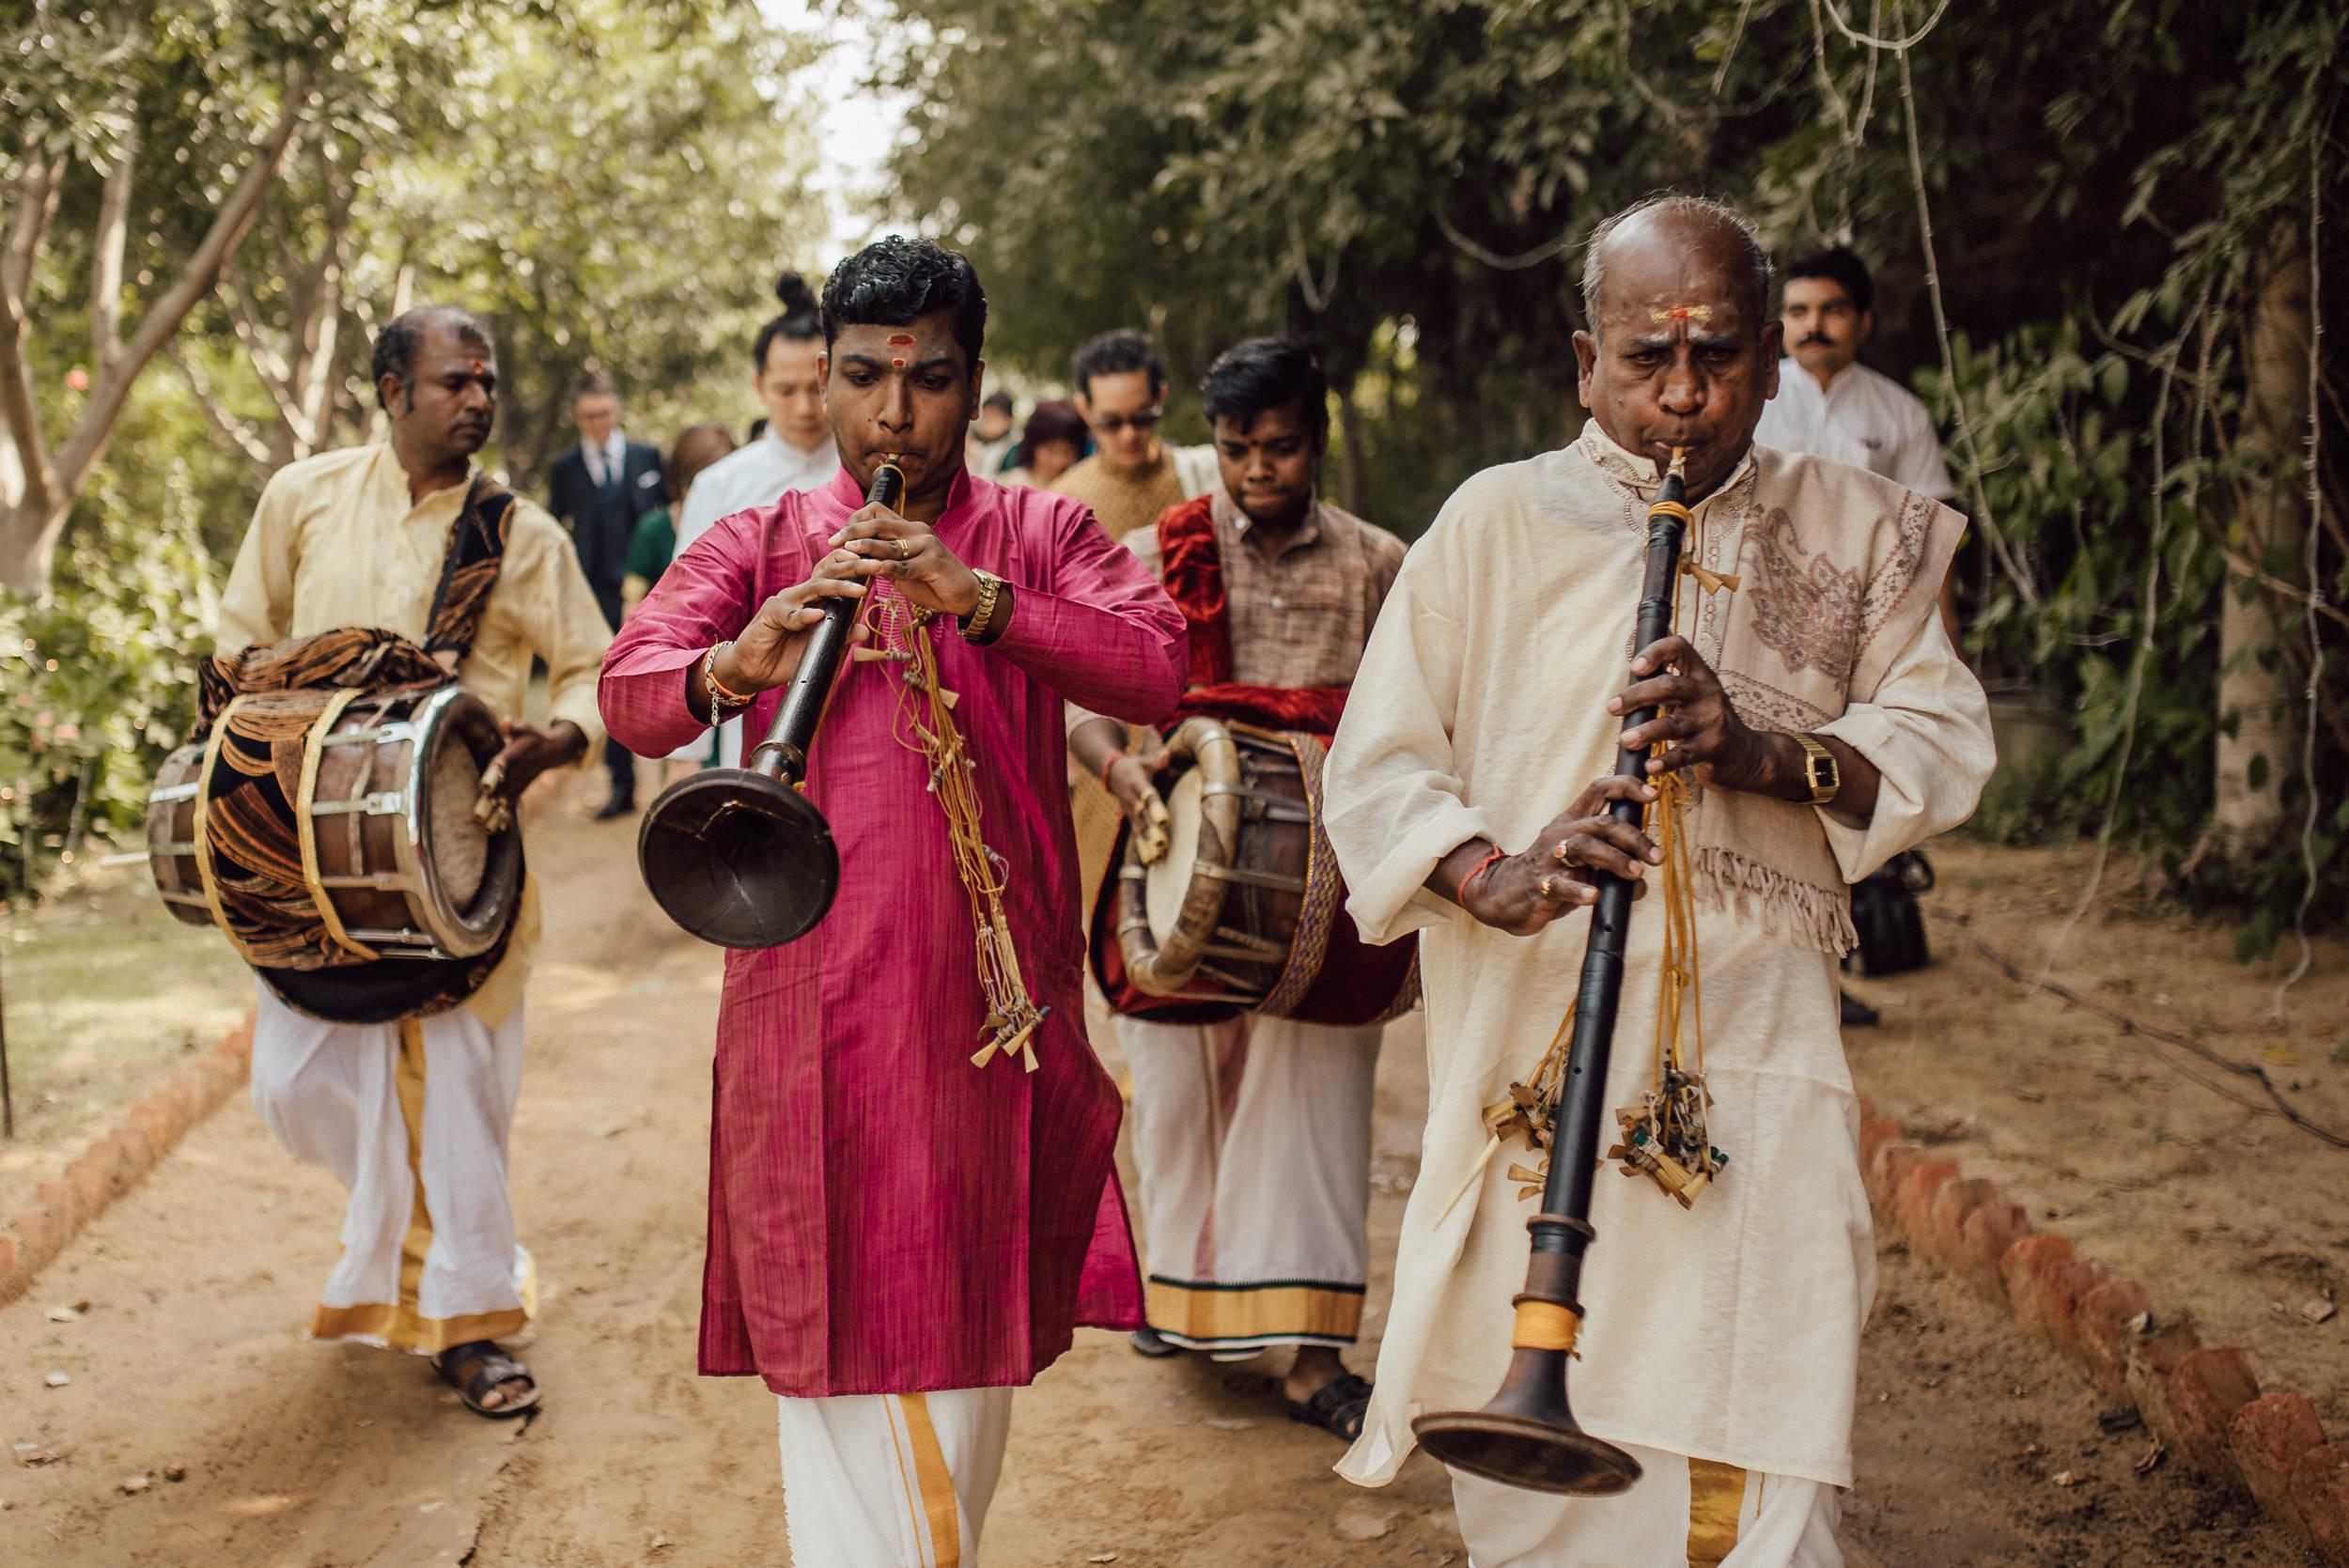 LiatAharoni-India-38.jpg